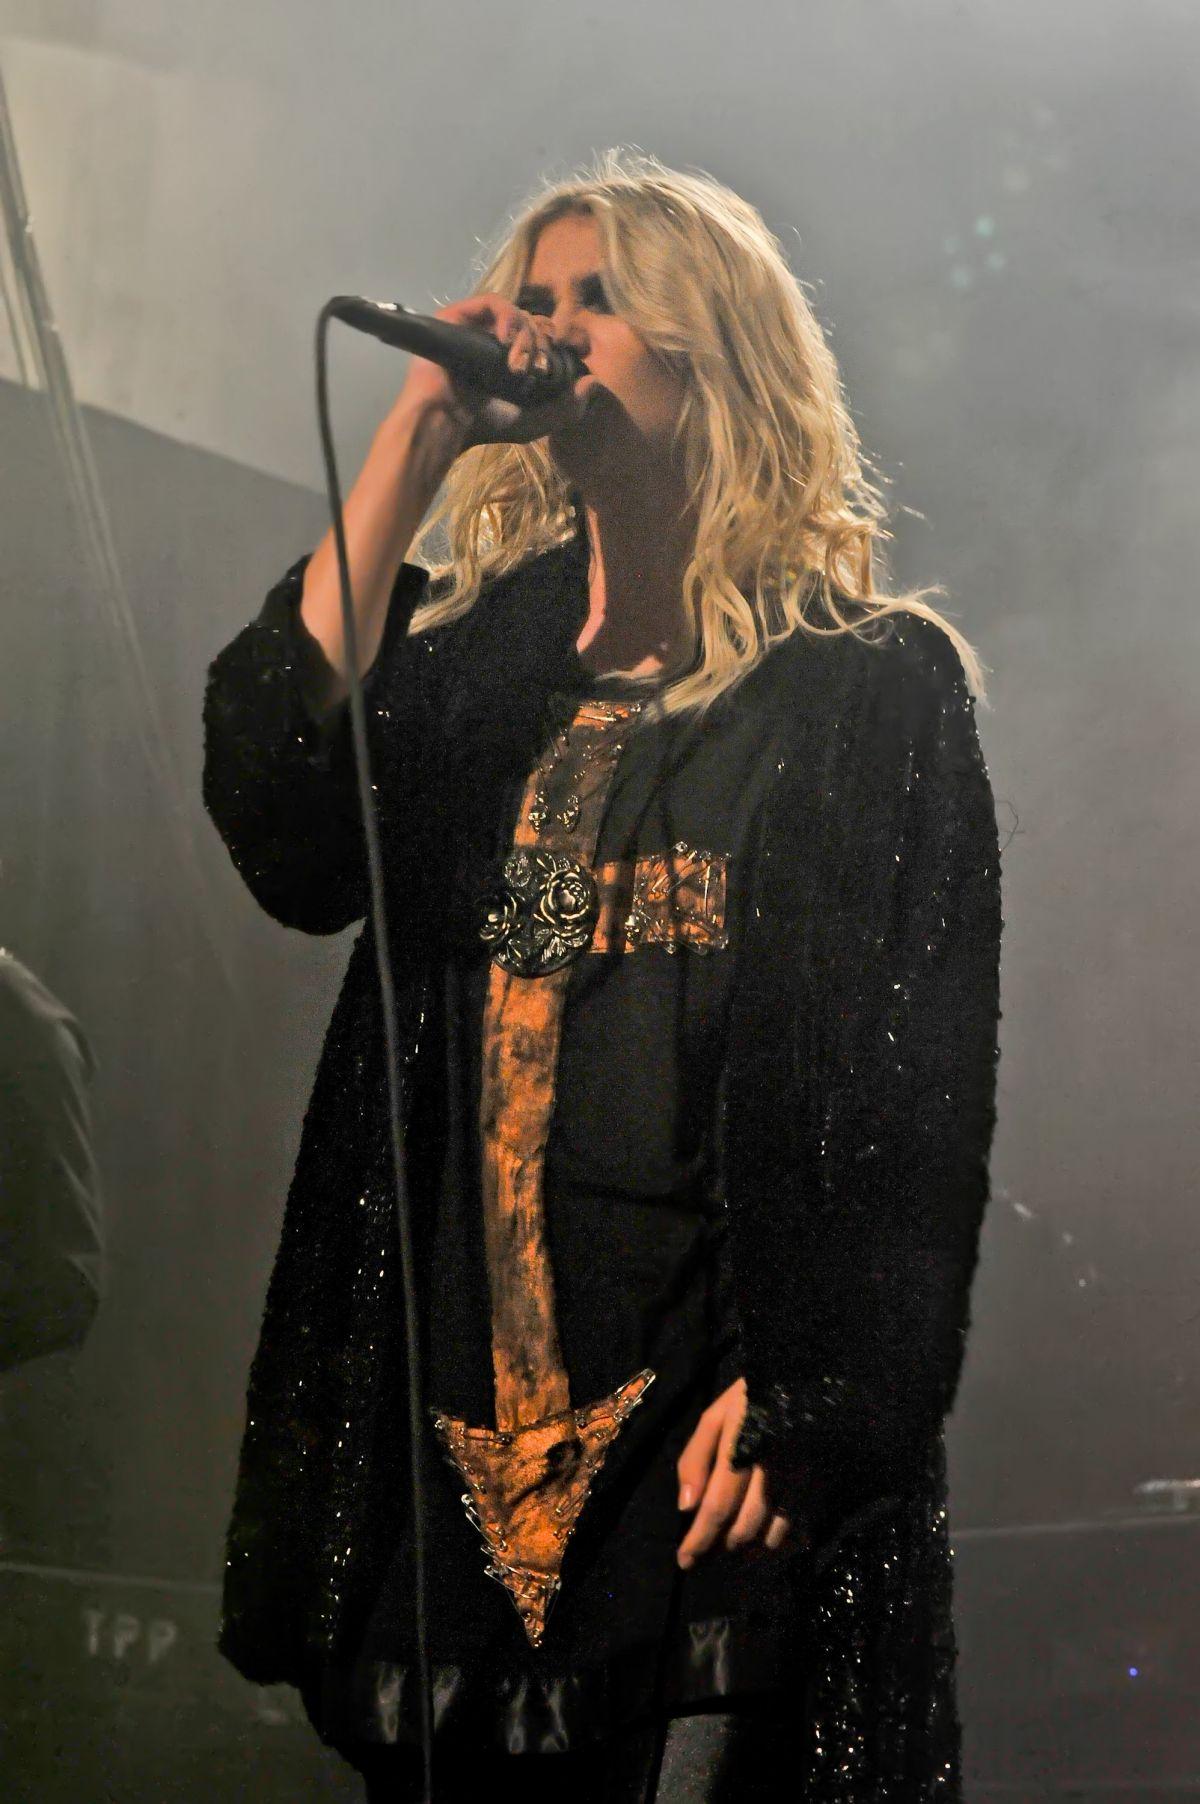 TAYLOR MOMSEN Performs at Emo